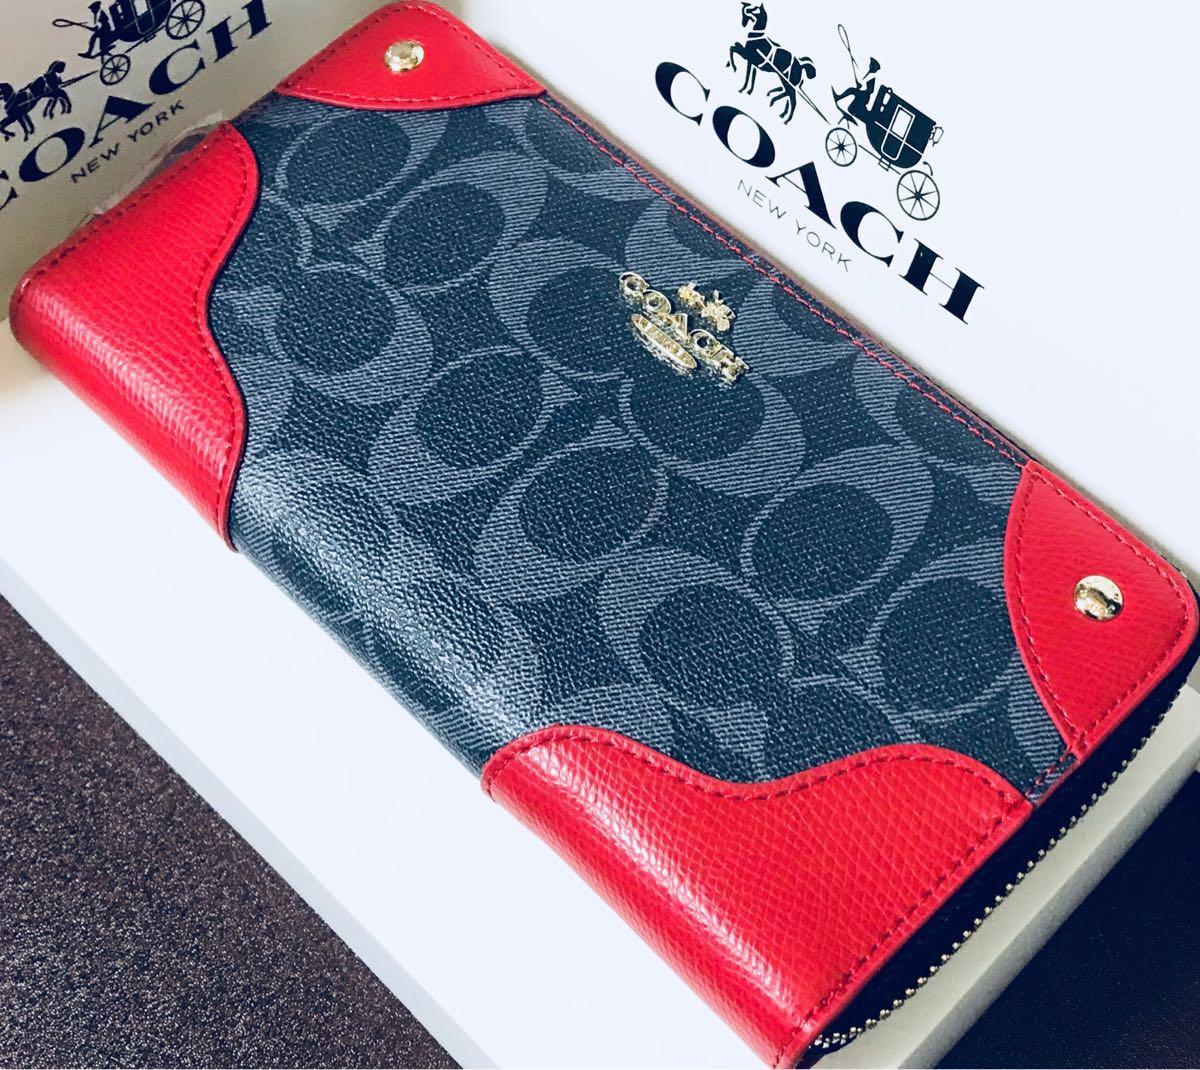 hot sale online 2cdf2 55121 COACH 長財布 赤 ワインレッド シグネチャー柄 レザー 正規品 ...